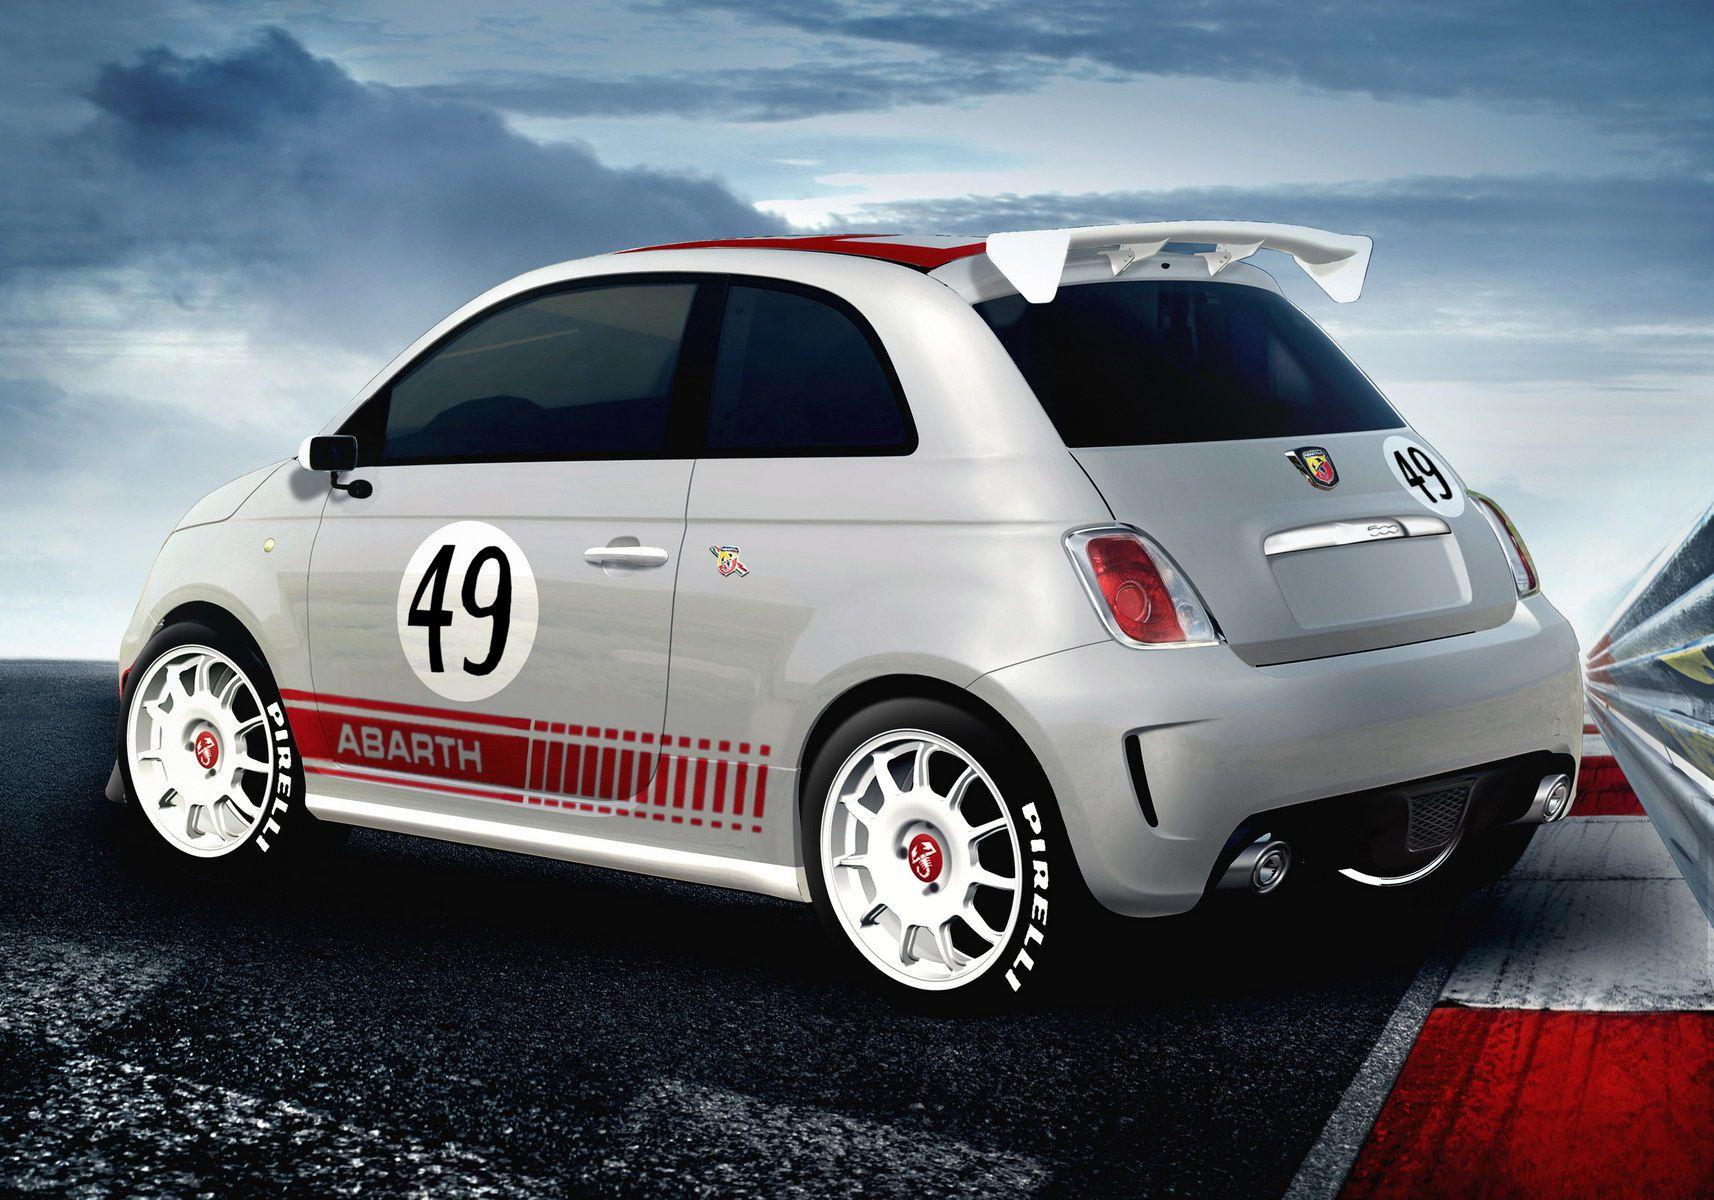 fiat 500 abarth 1.4 16v limited edition turbo 200 bhp 'assetto corse